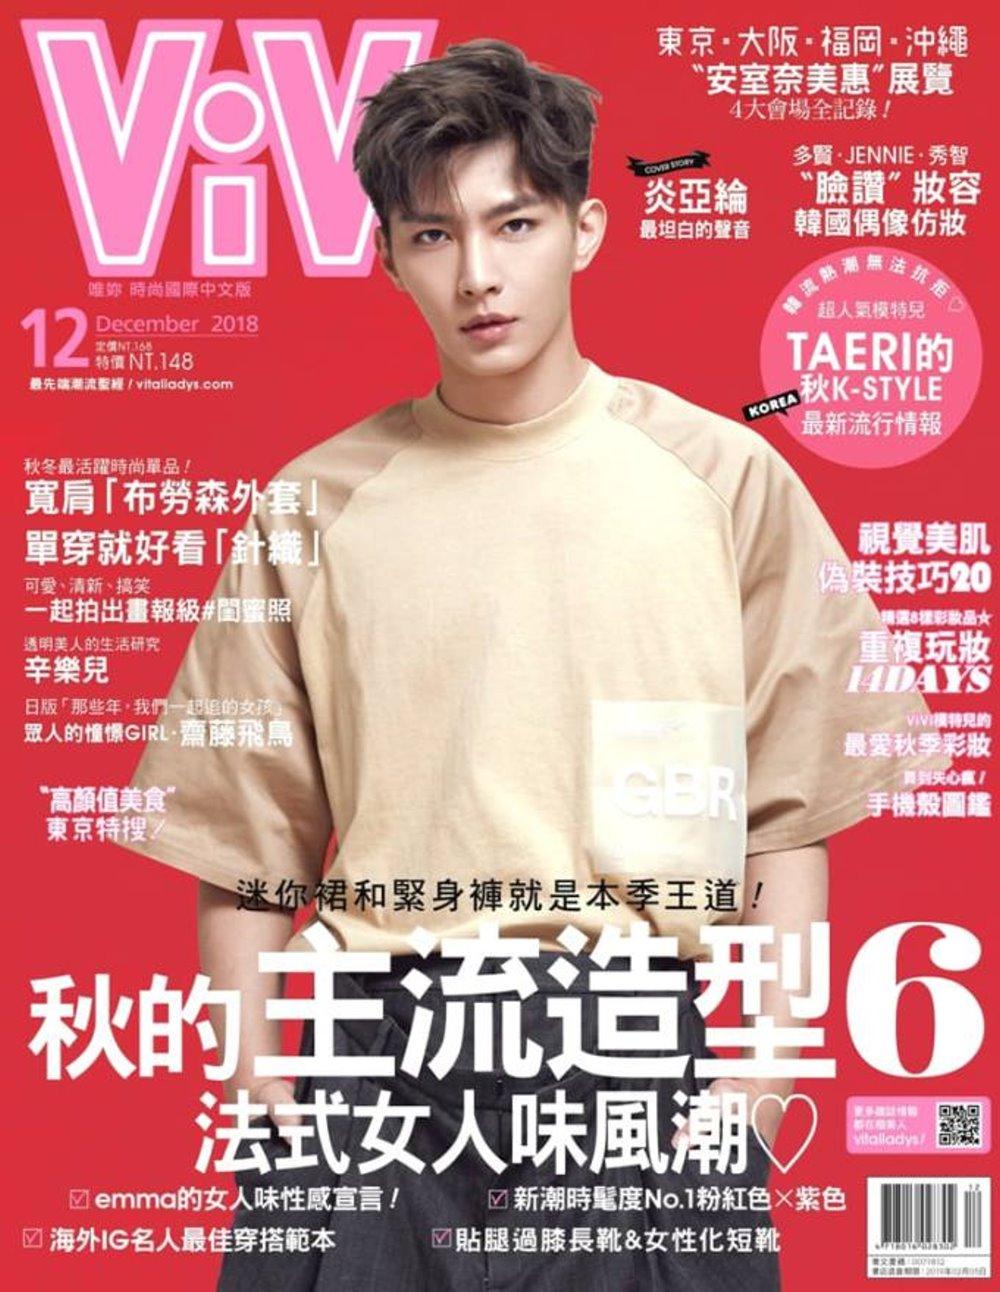 ViVi唯妳時尚國際中文版 12月號/2018 第153期